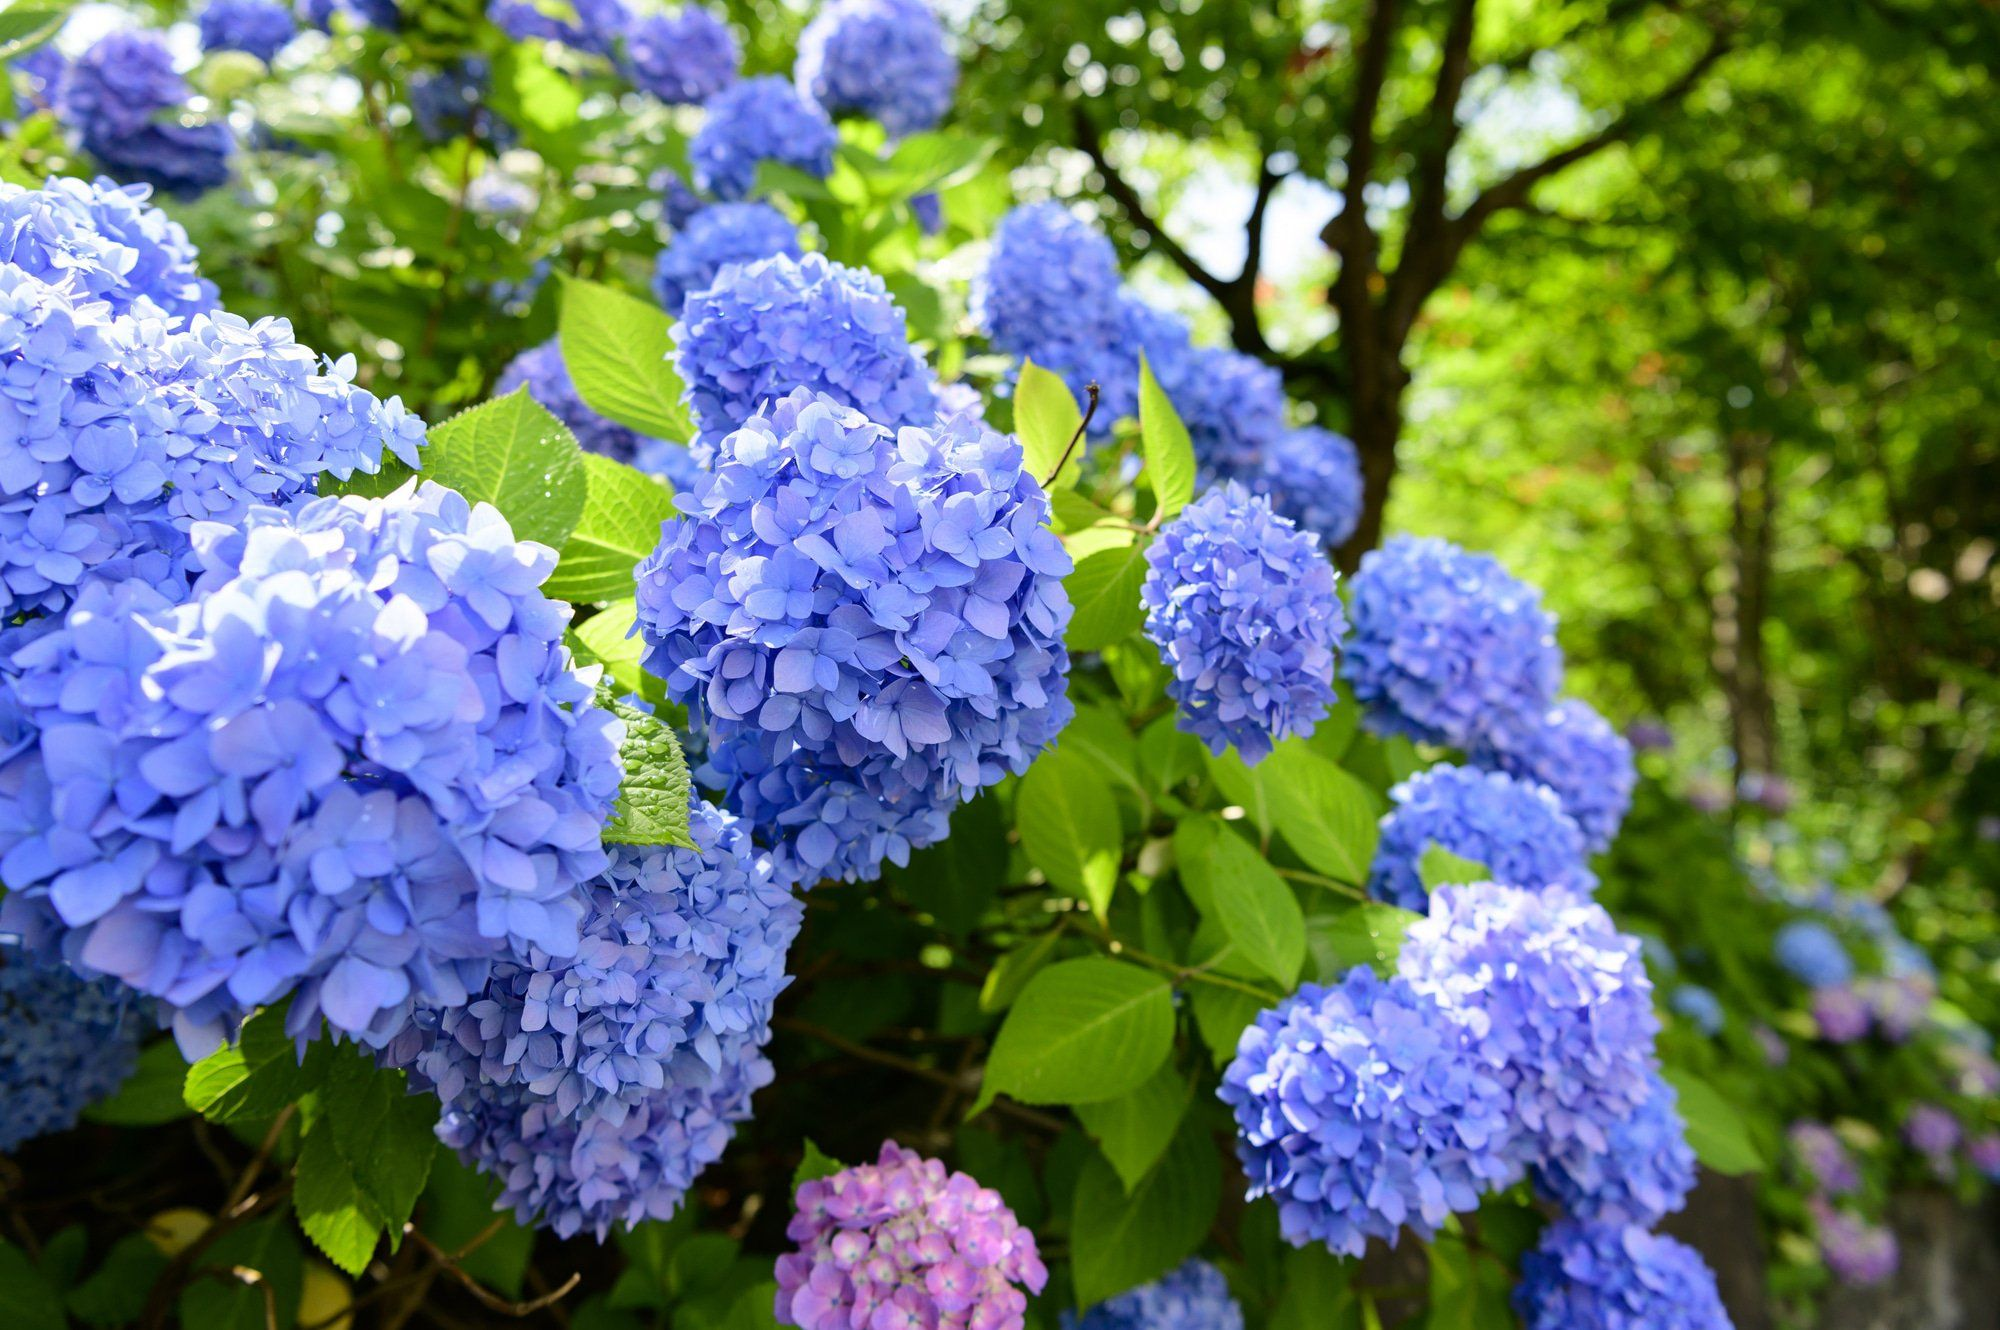 Hydrangeas And The Rainy Season Japan S Flower Of Early Summer Matcha Japan Travel Web Magazine The Rain In 2020 Japan Flower Hydrangea Bloom Types Of Hydrangeas